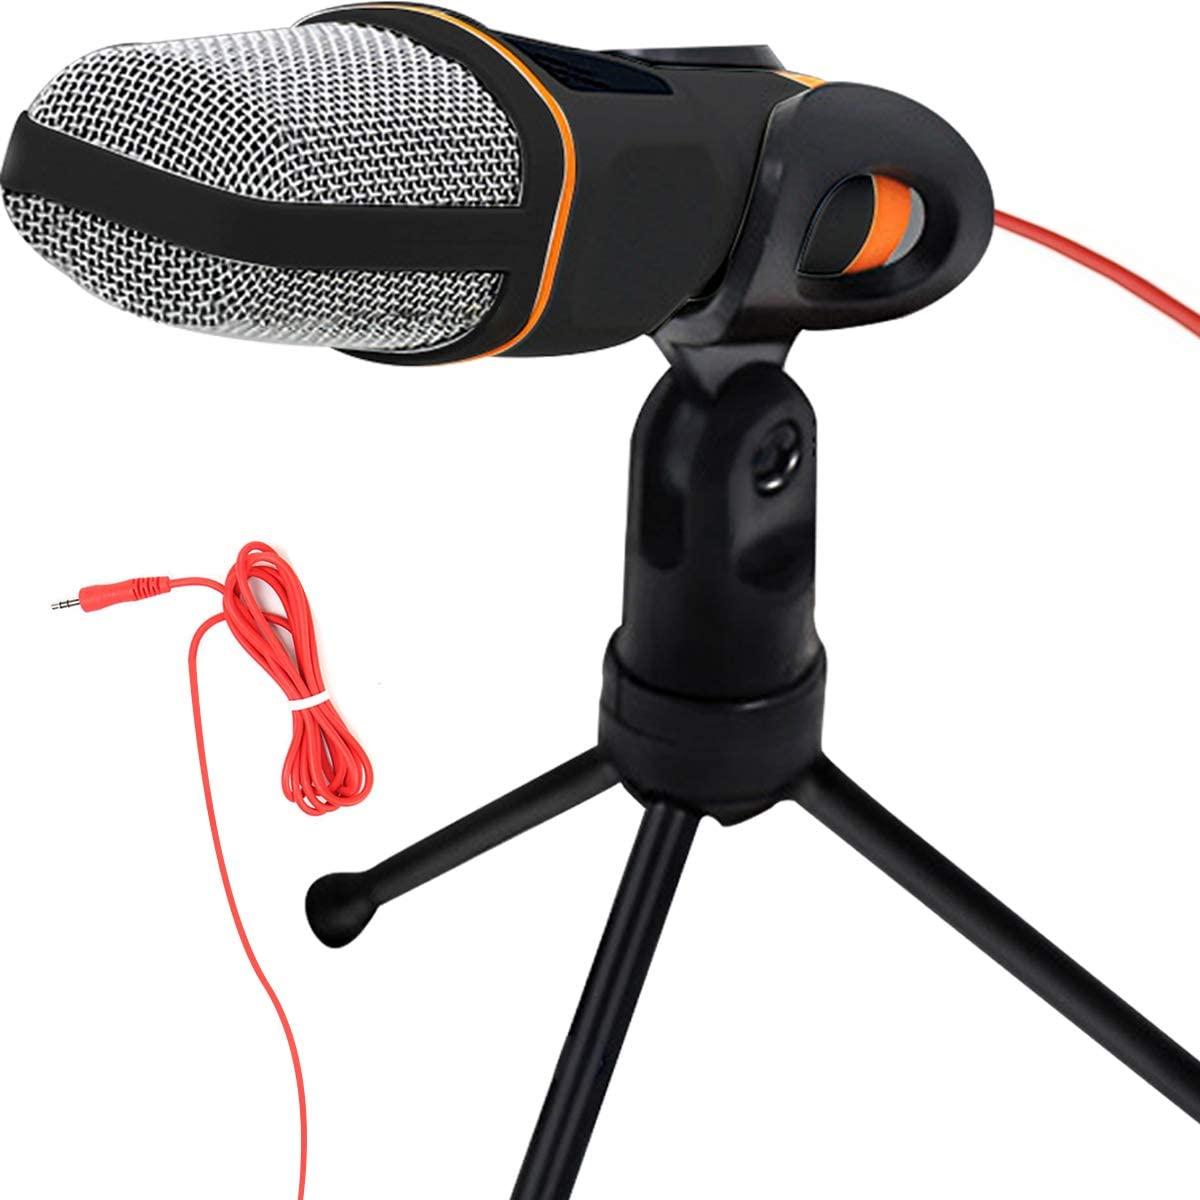 Micrófono regreso a clases